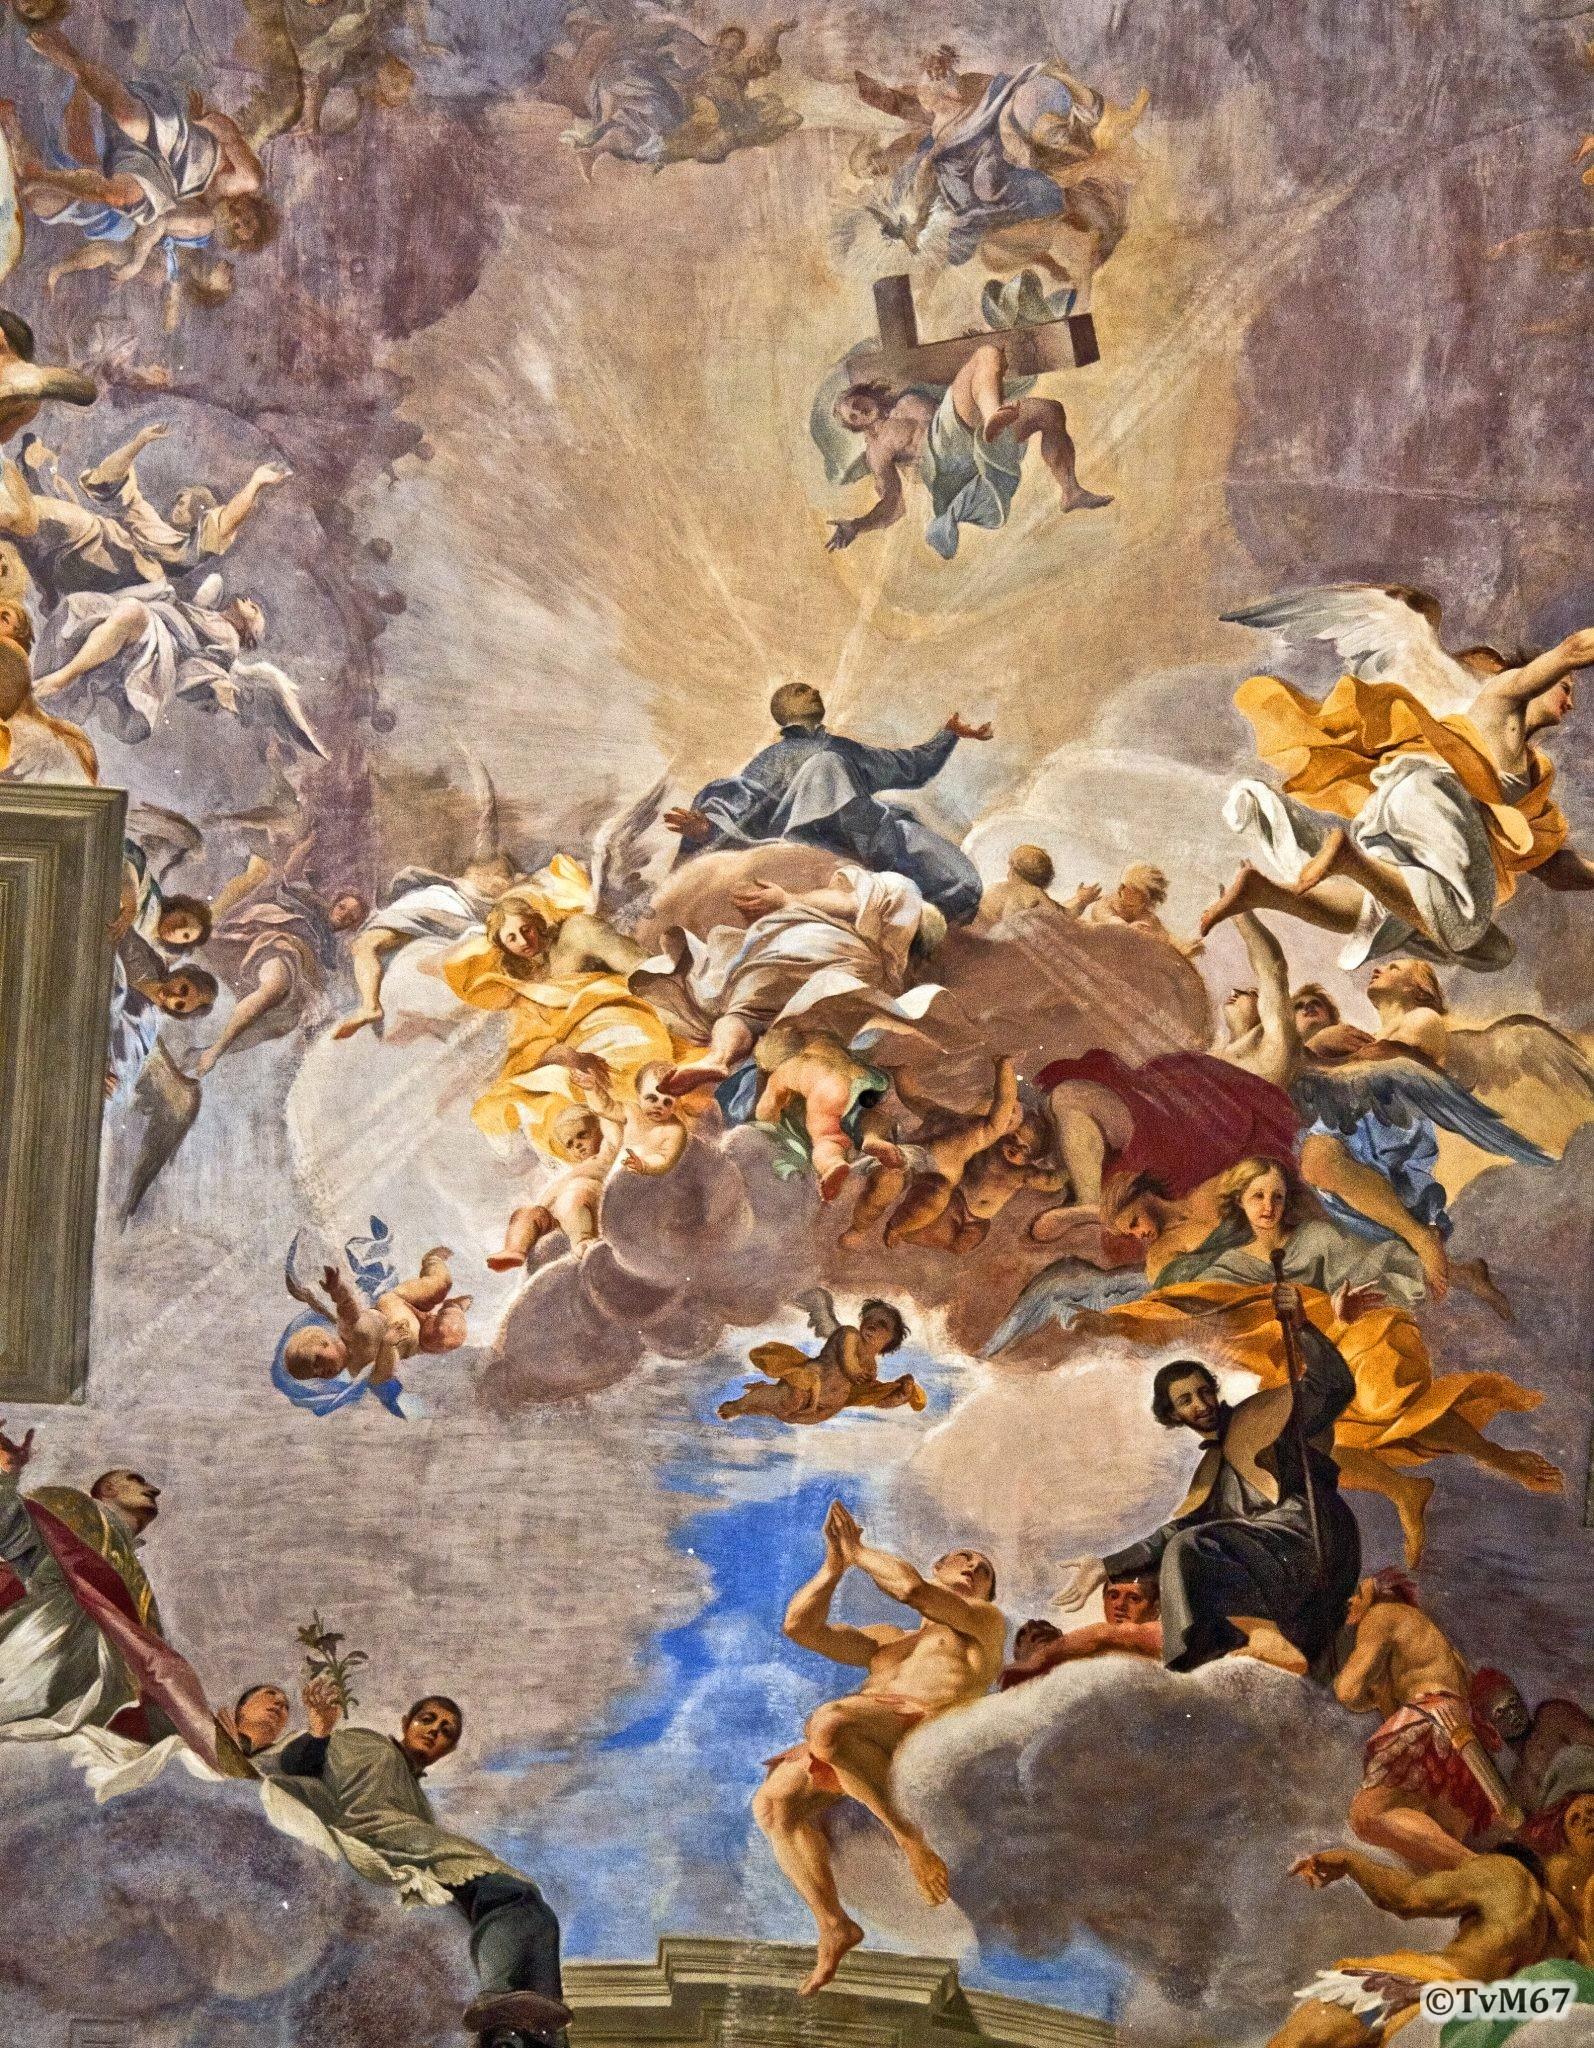 Roma, Chiesa di Sant'Ignazio, Middenschip, Pozzo, Plafond, detail mdiddendeel